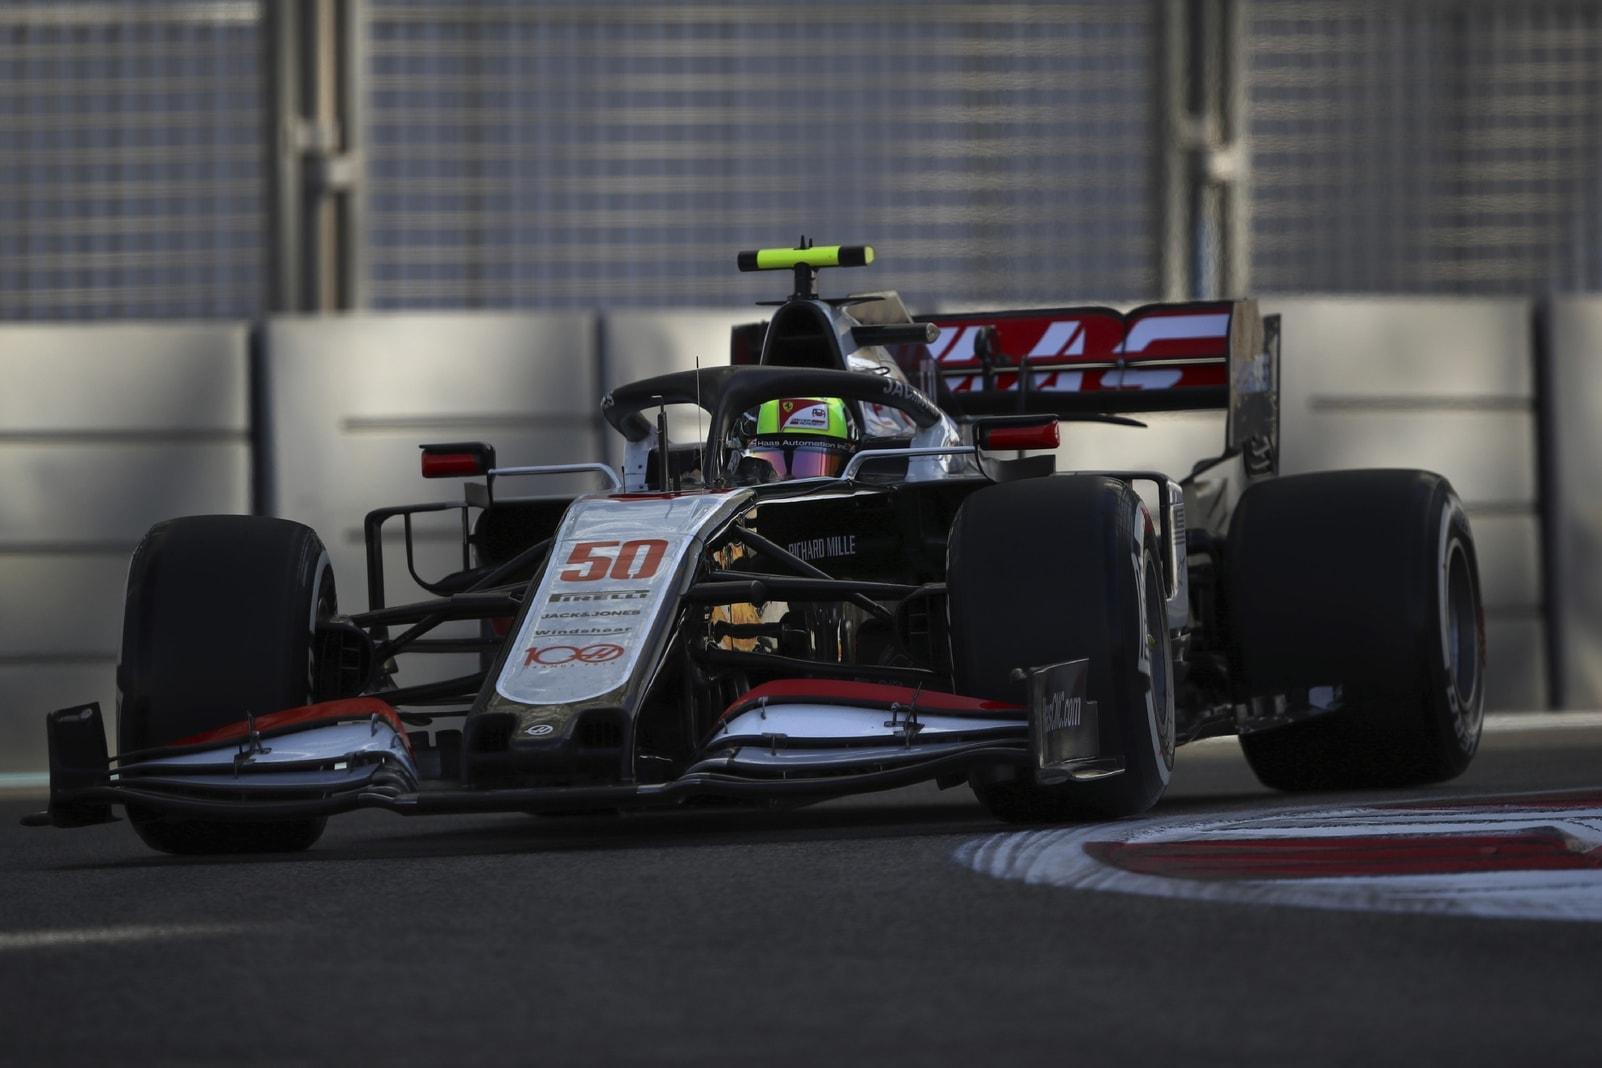 Mick Schumacher Formel 1-Debüt Haas Abu Dhabi 3